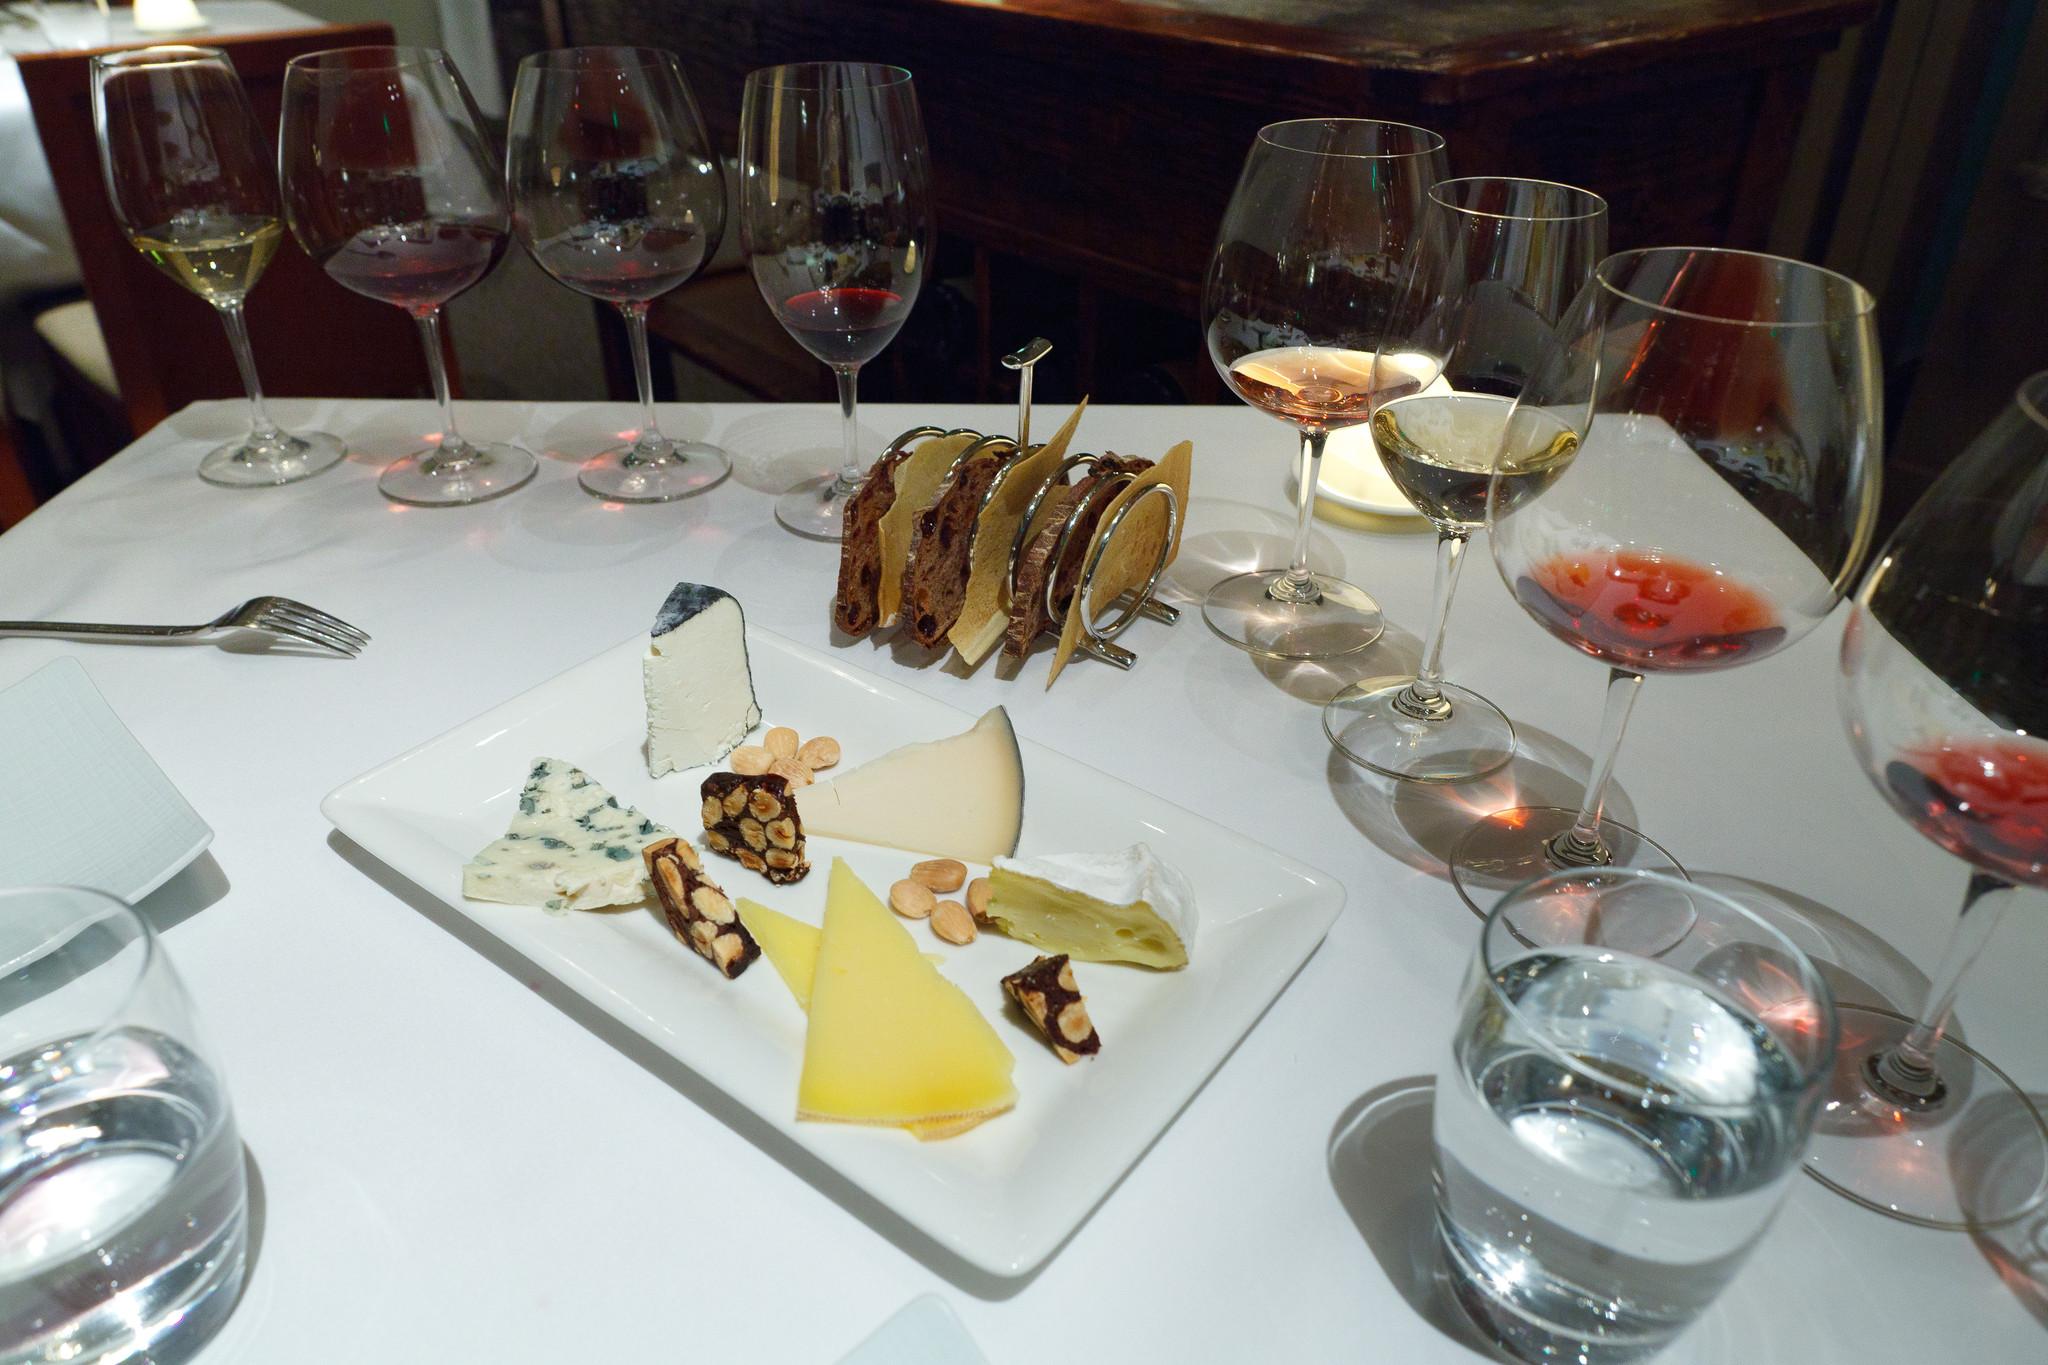 Cheese course - Roquefort, Chevrière cendre (concord grape ash), Gouda-style Midnight moon, Cow's milk Pleasant ridge reserve, Bent River